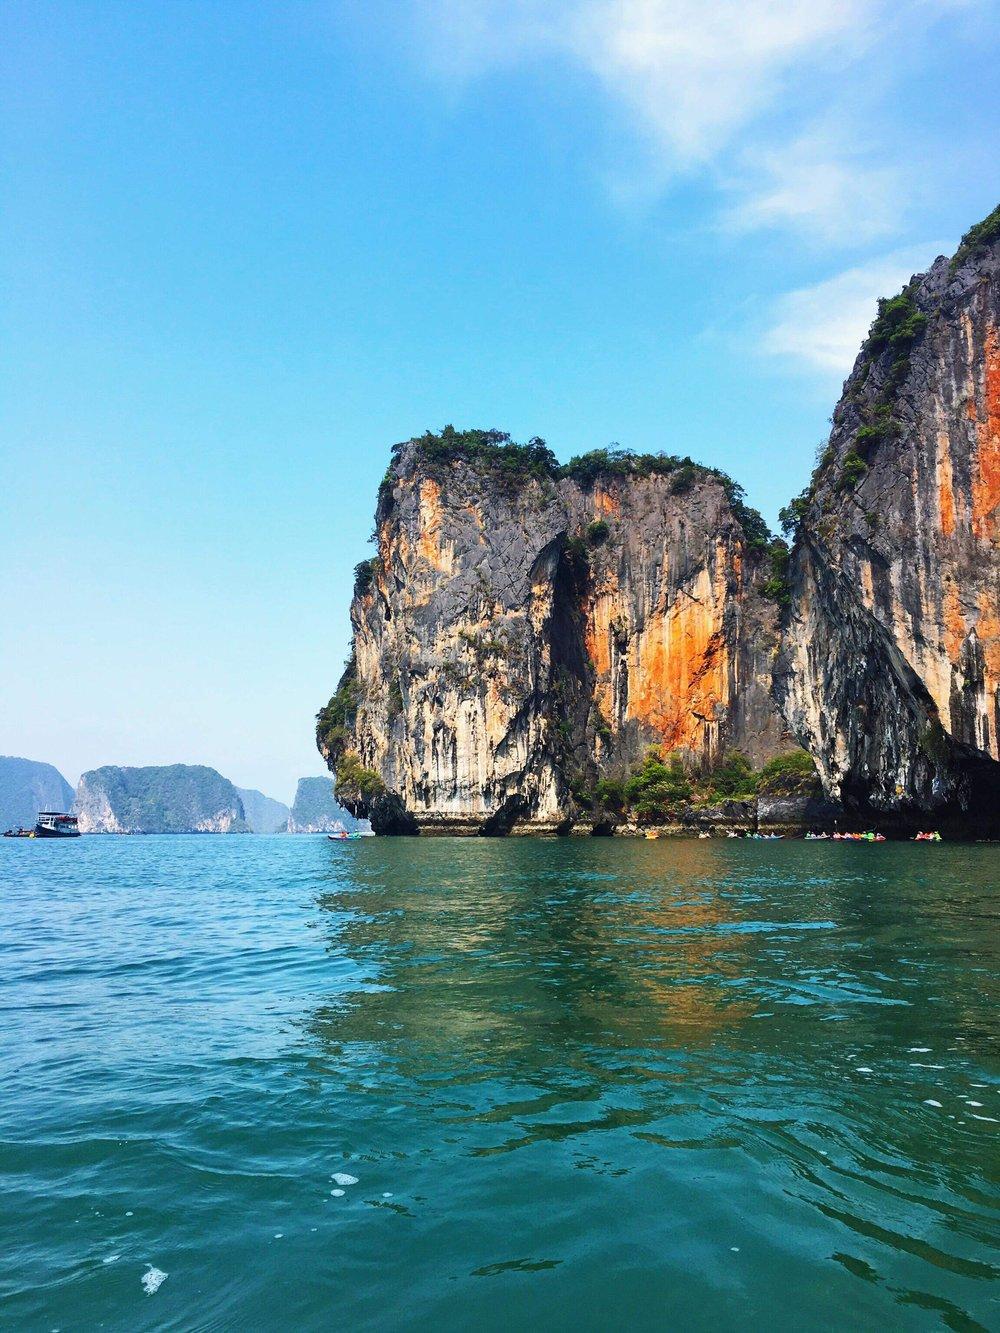 Islands off the coast of Southwest Thailand